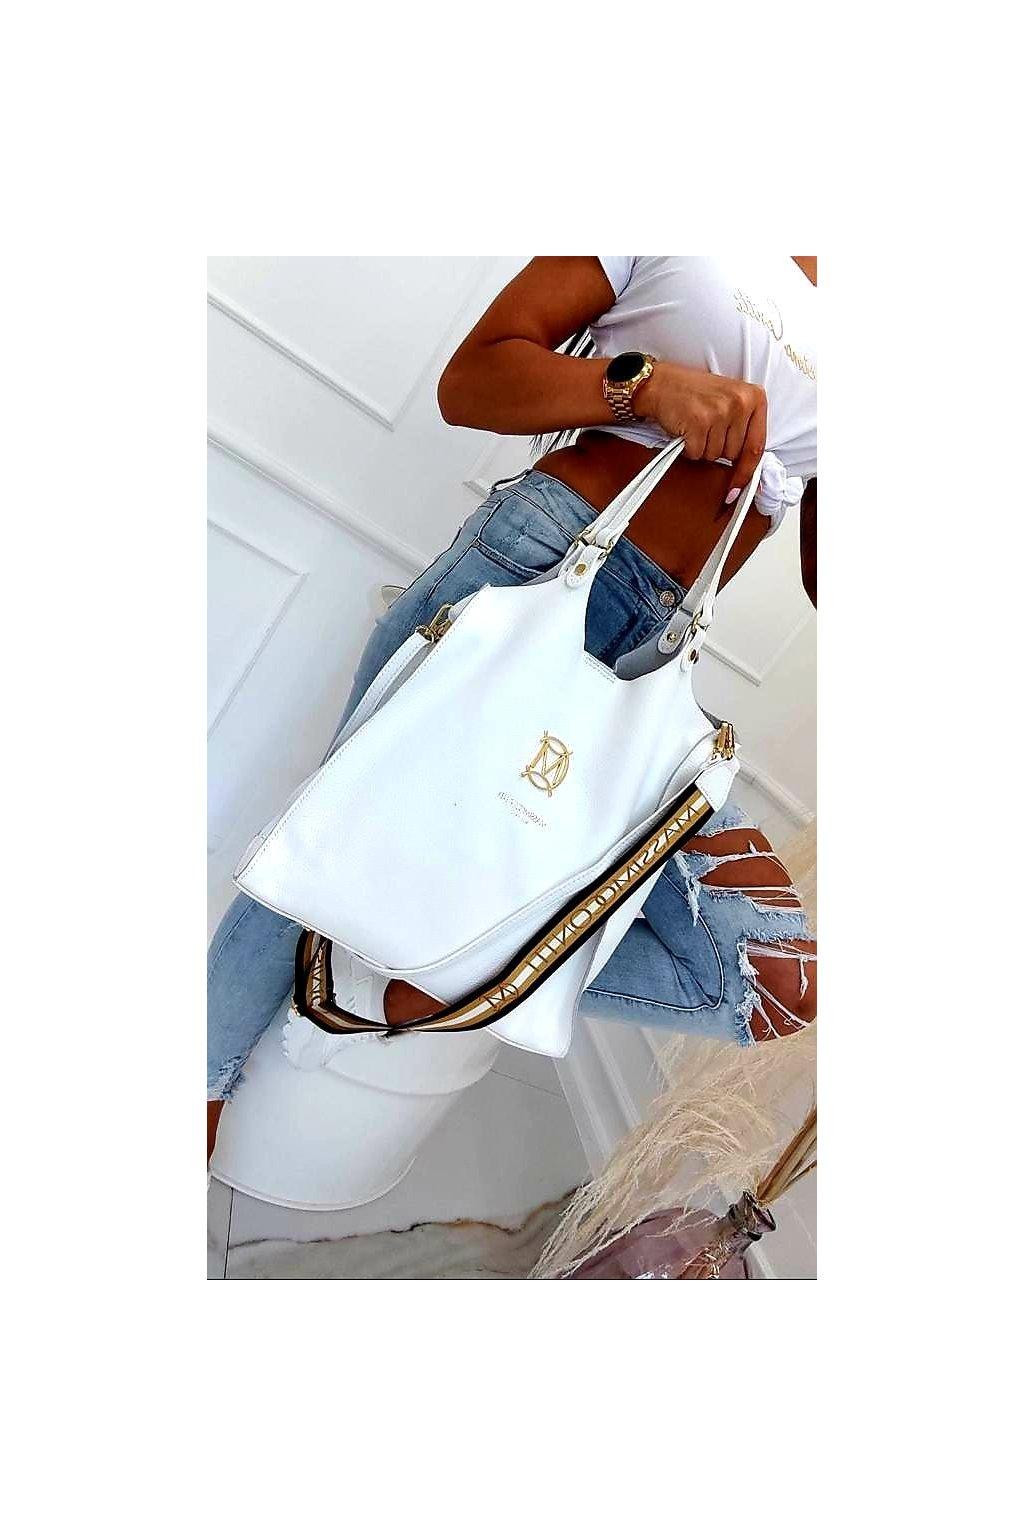 kabelka massimo contti bílá white kůže italy fashion top kabelka